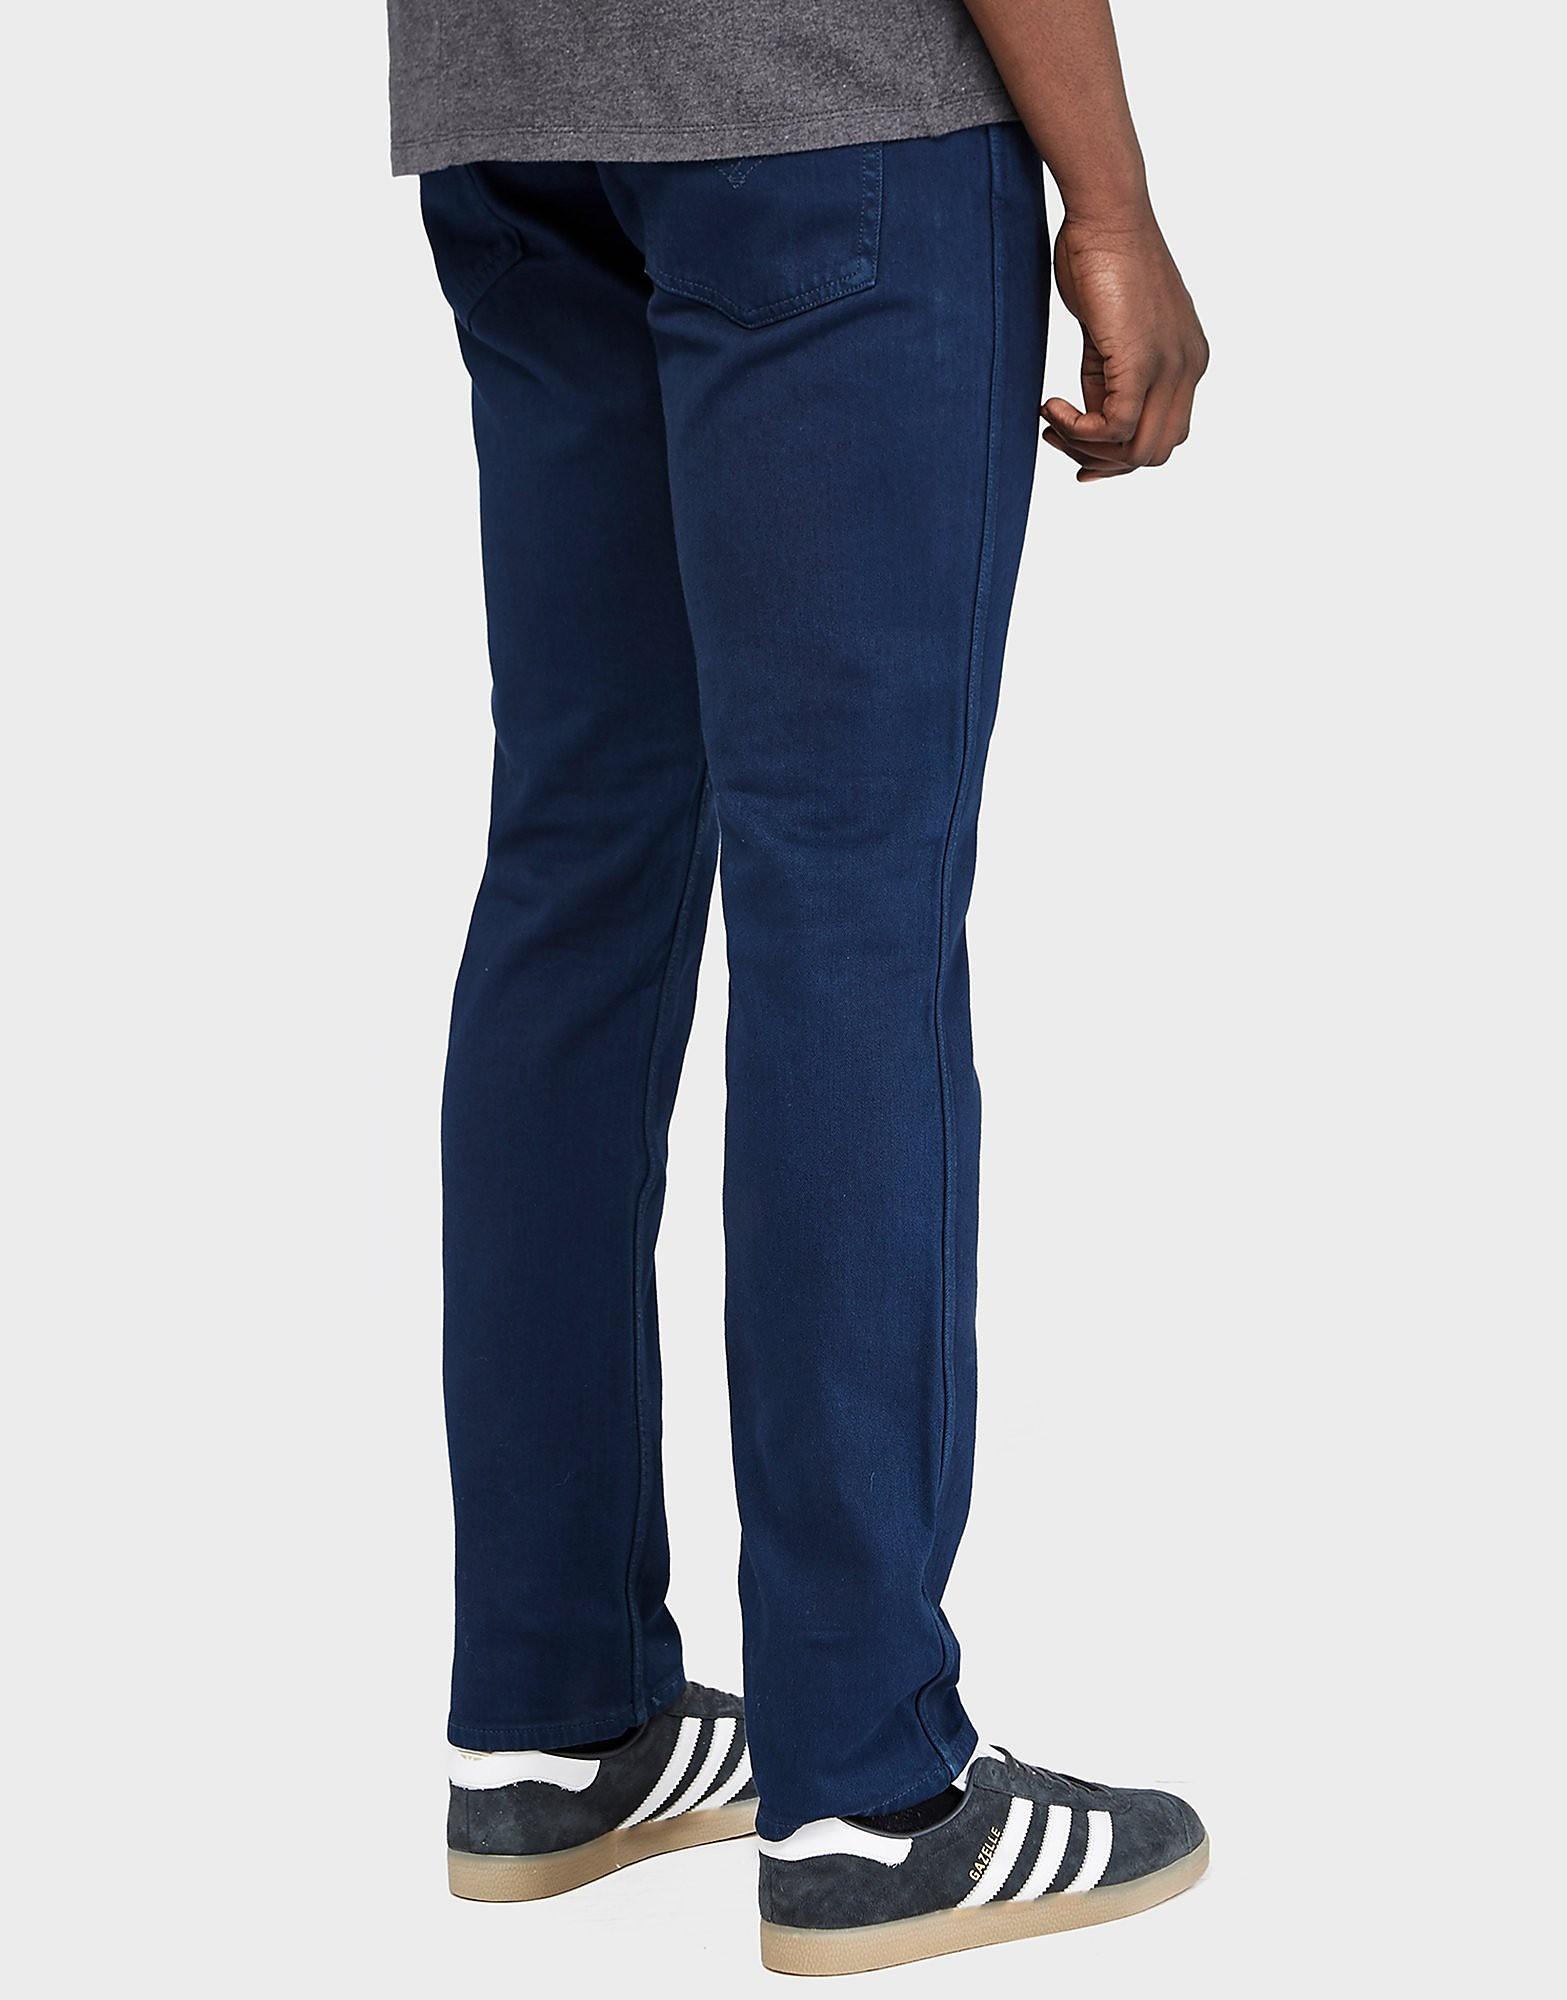 Levis Slim Straight Leg Jeans